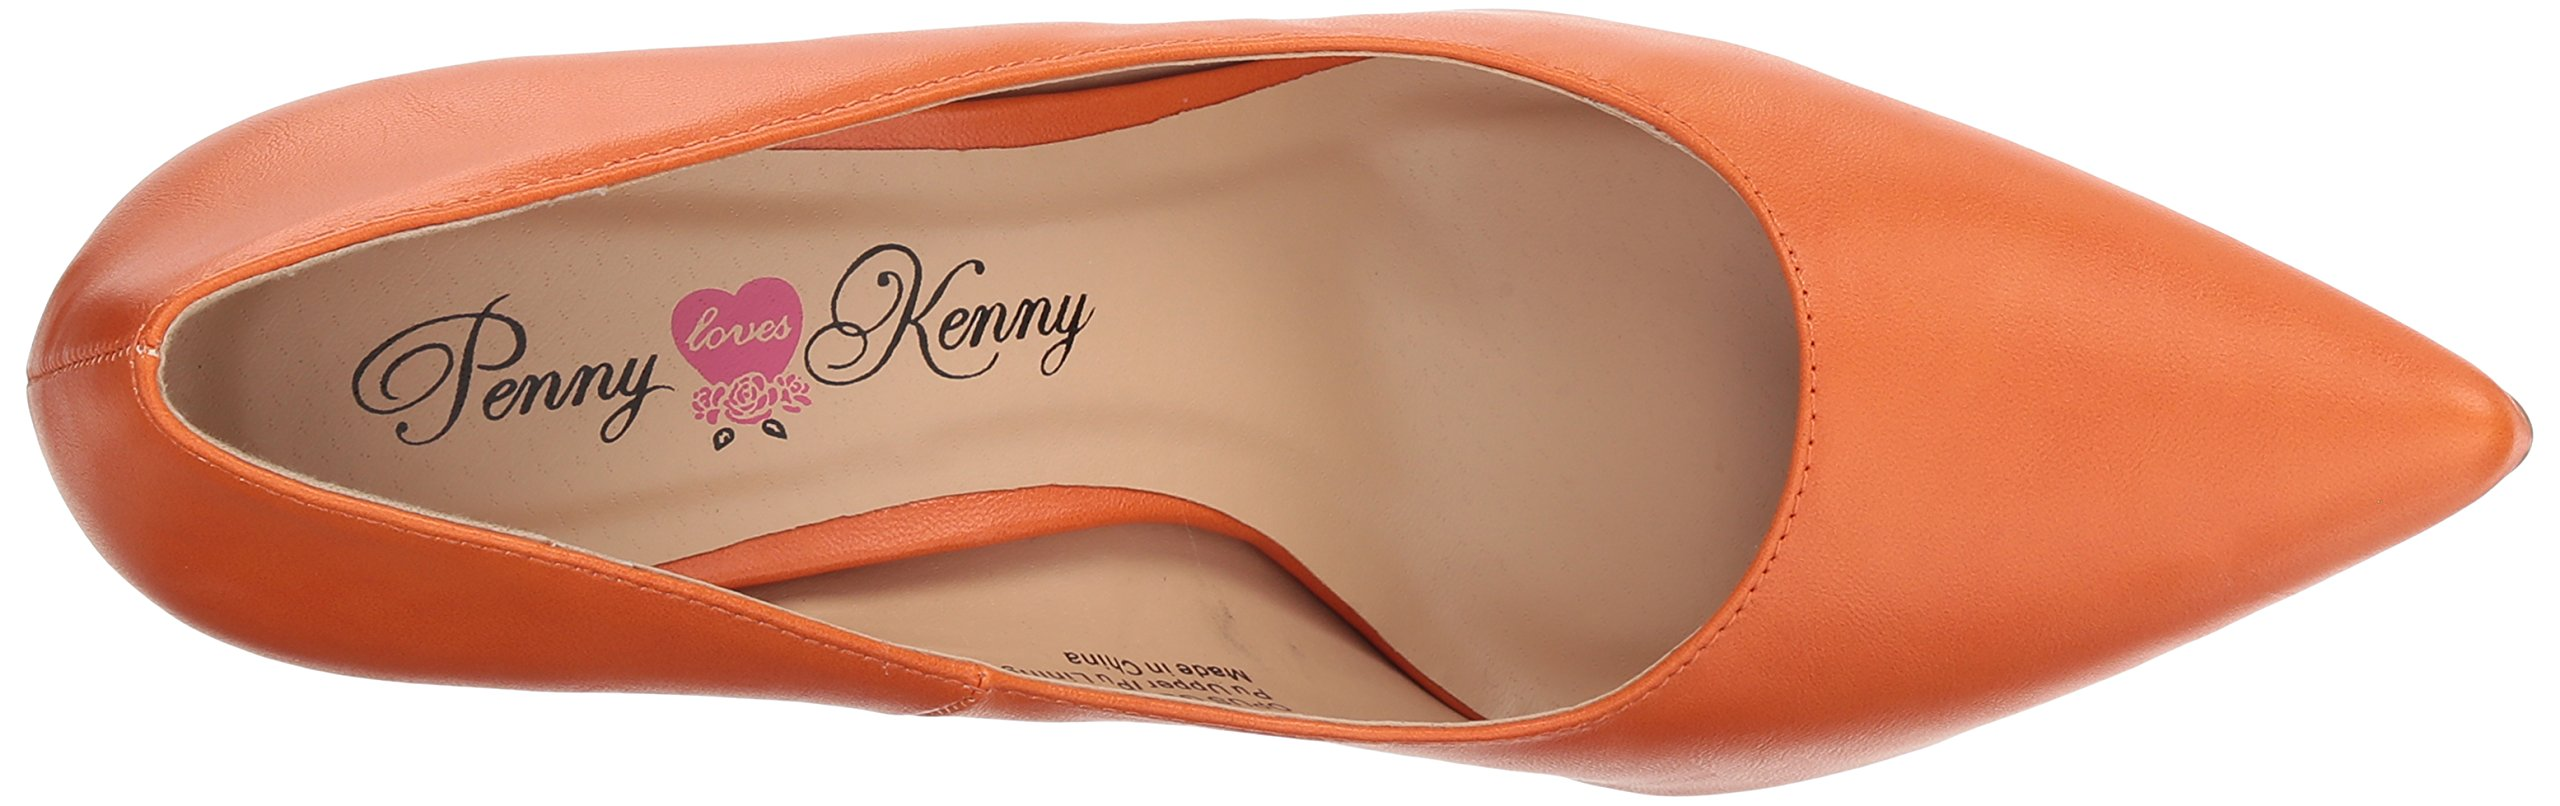 Penny Loves Kenny Women's Opus GL Pump, Orange, 13 Wide US by Penny Loves Kenny (Image #7)